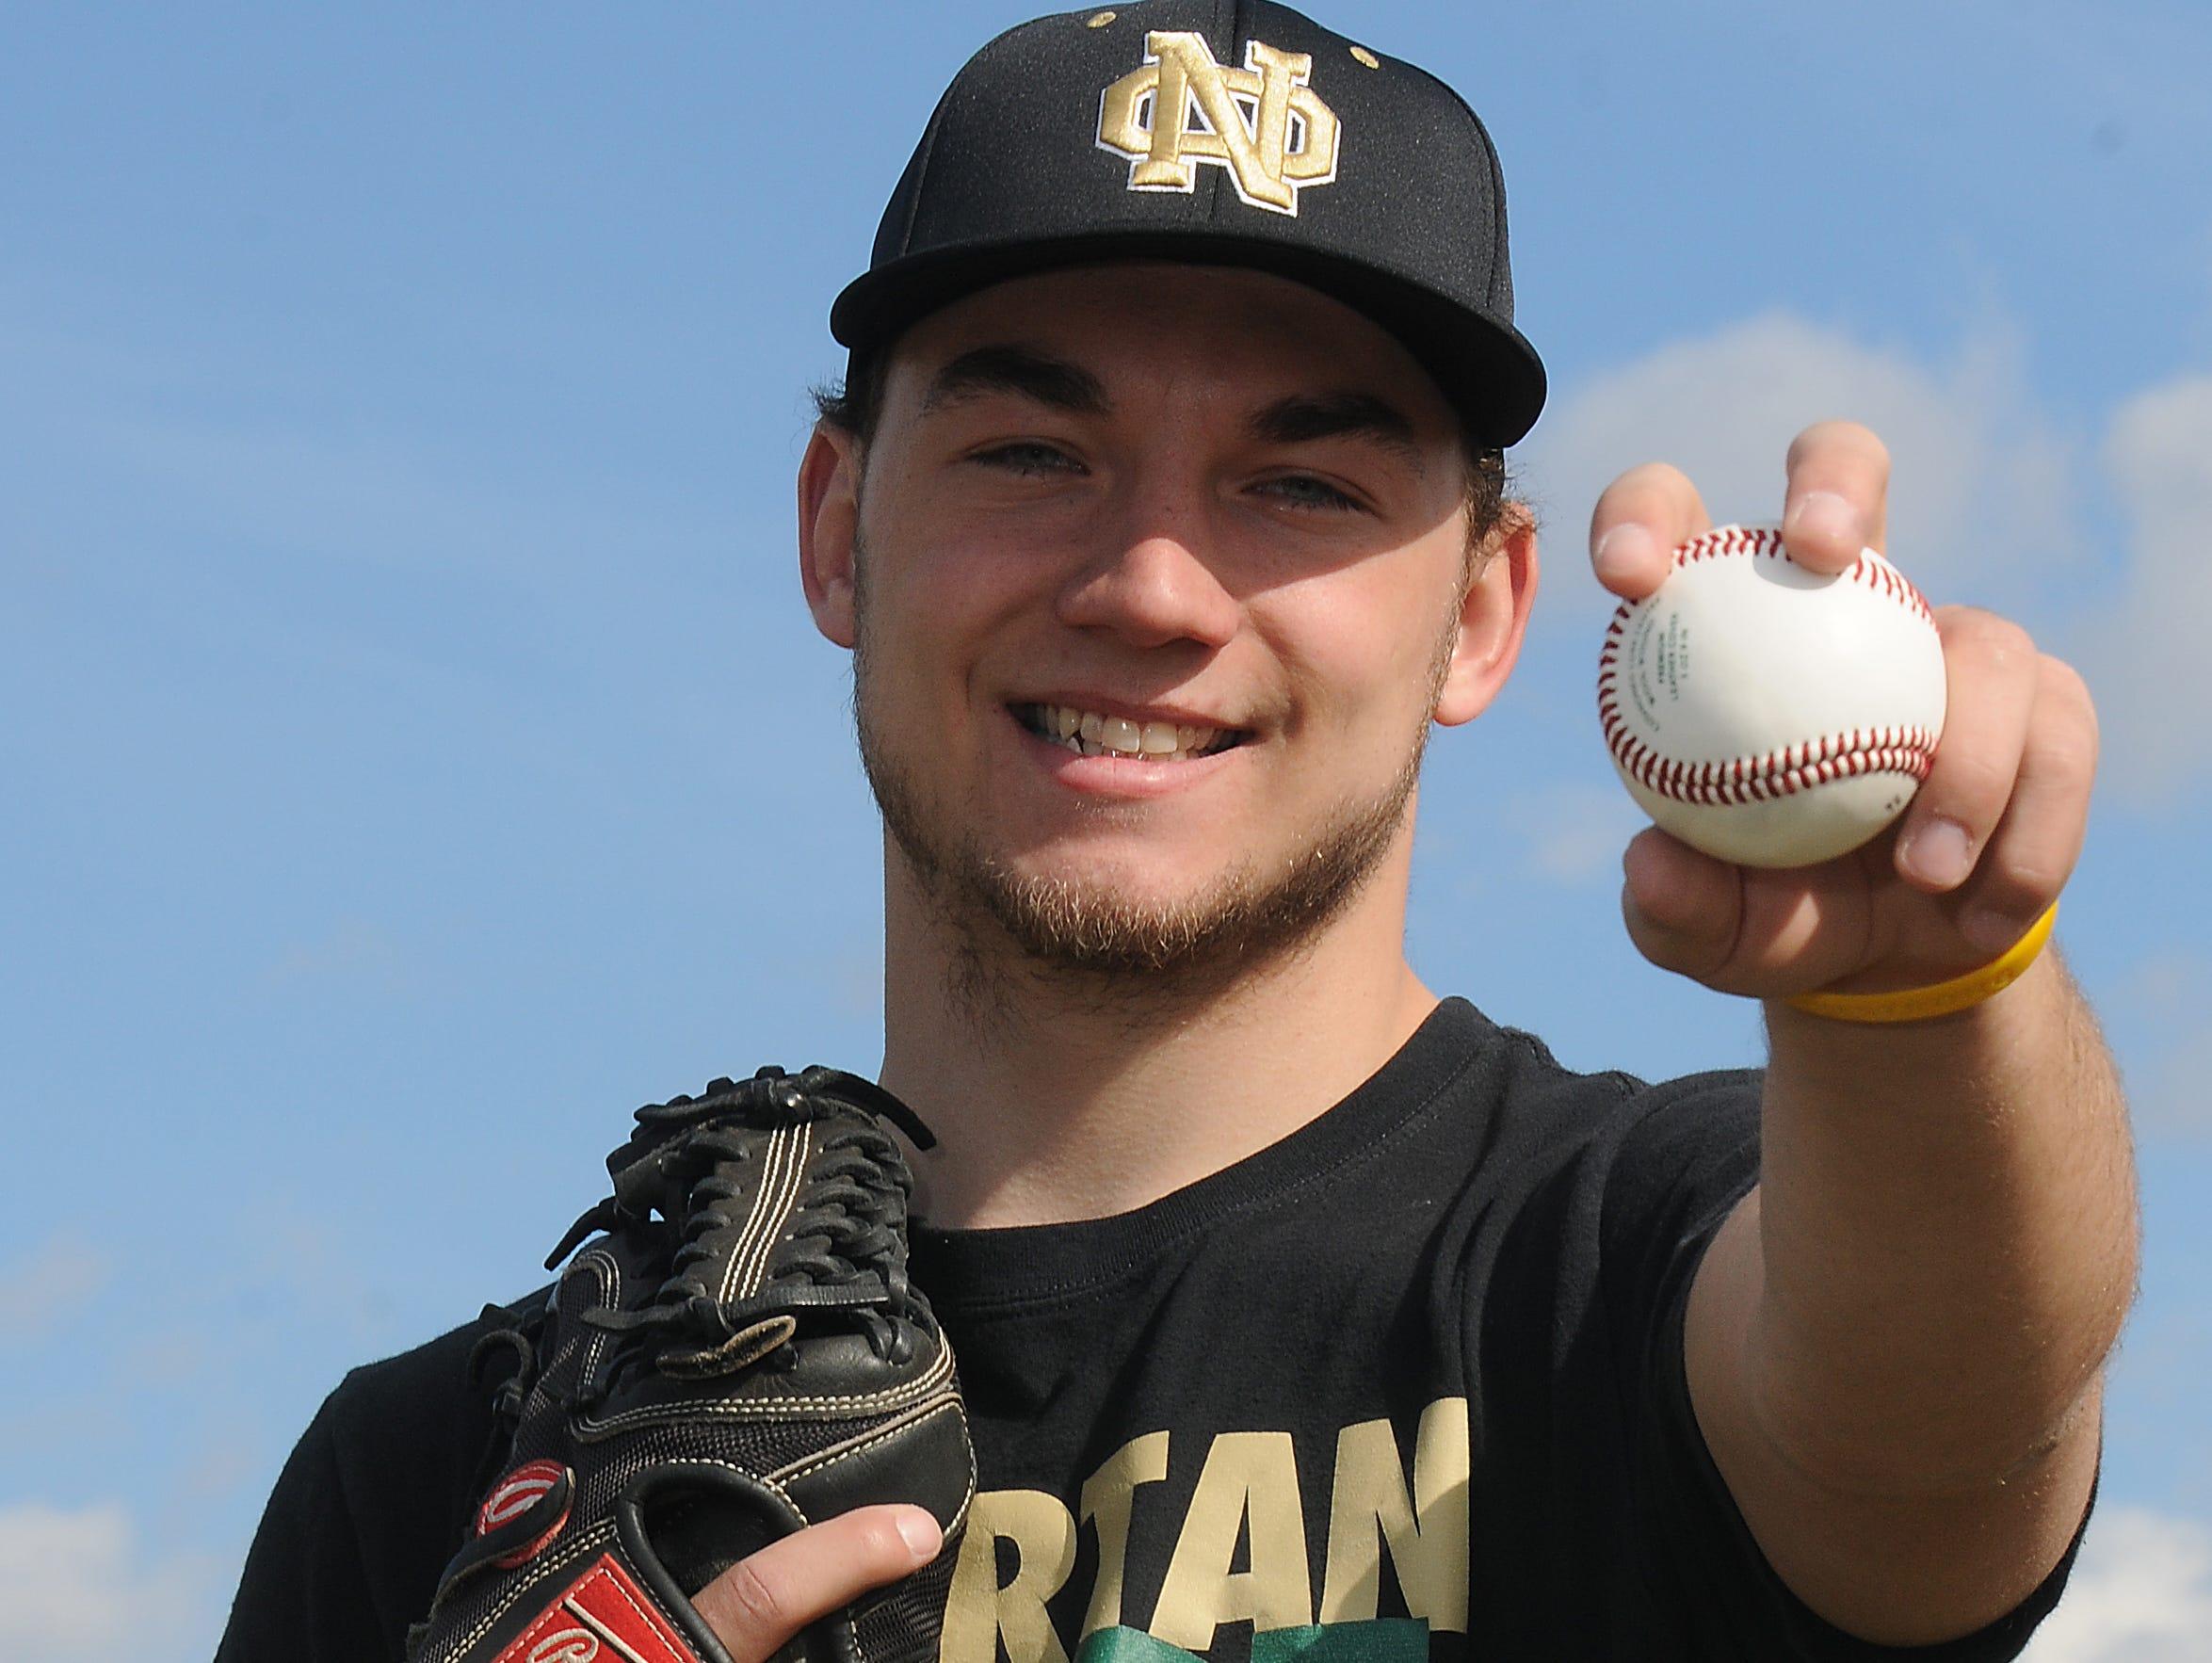 Oshkosh North's Alex Hintze will be attending the University of Connecticut on a baseball scholarship next fall.